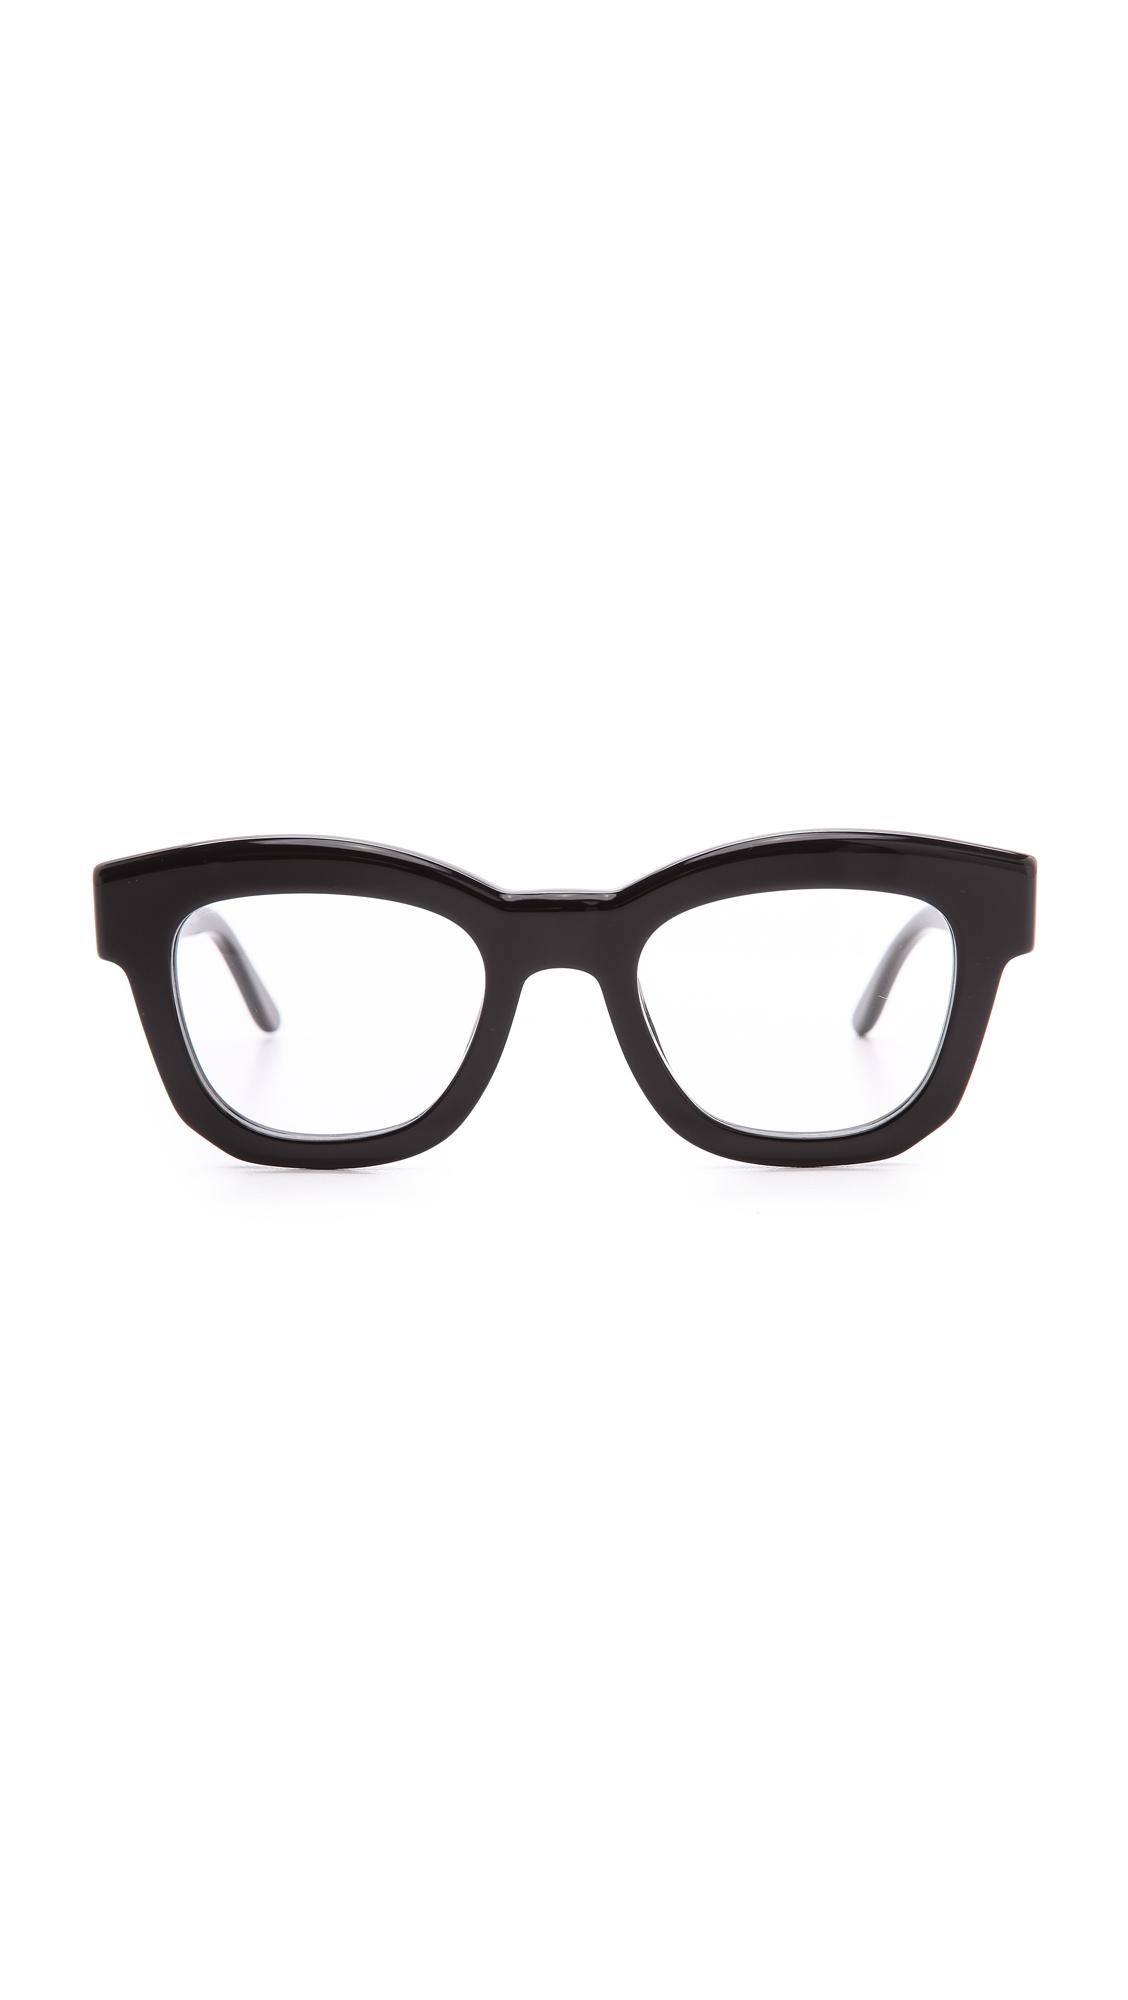 6b21b1a0cf Stella McCartney Thick Frame Glasses - Brown in Black - Lyst